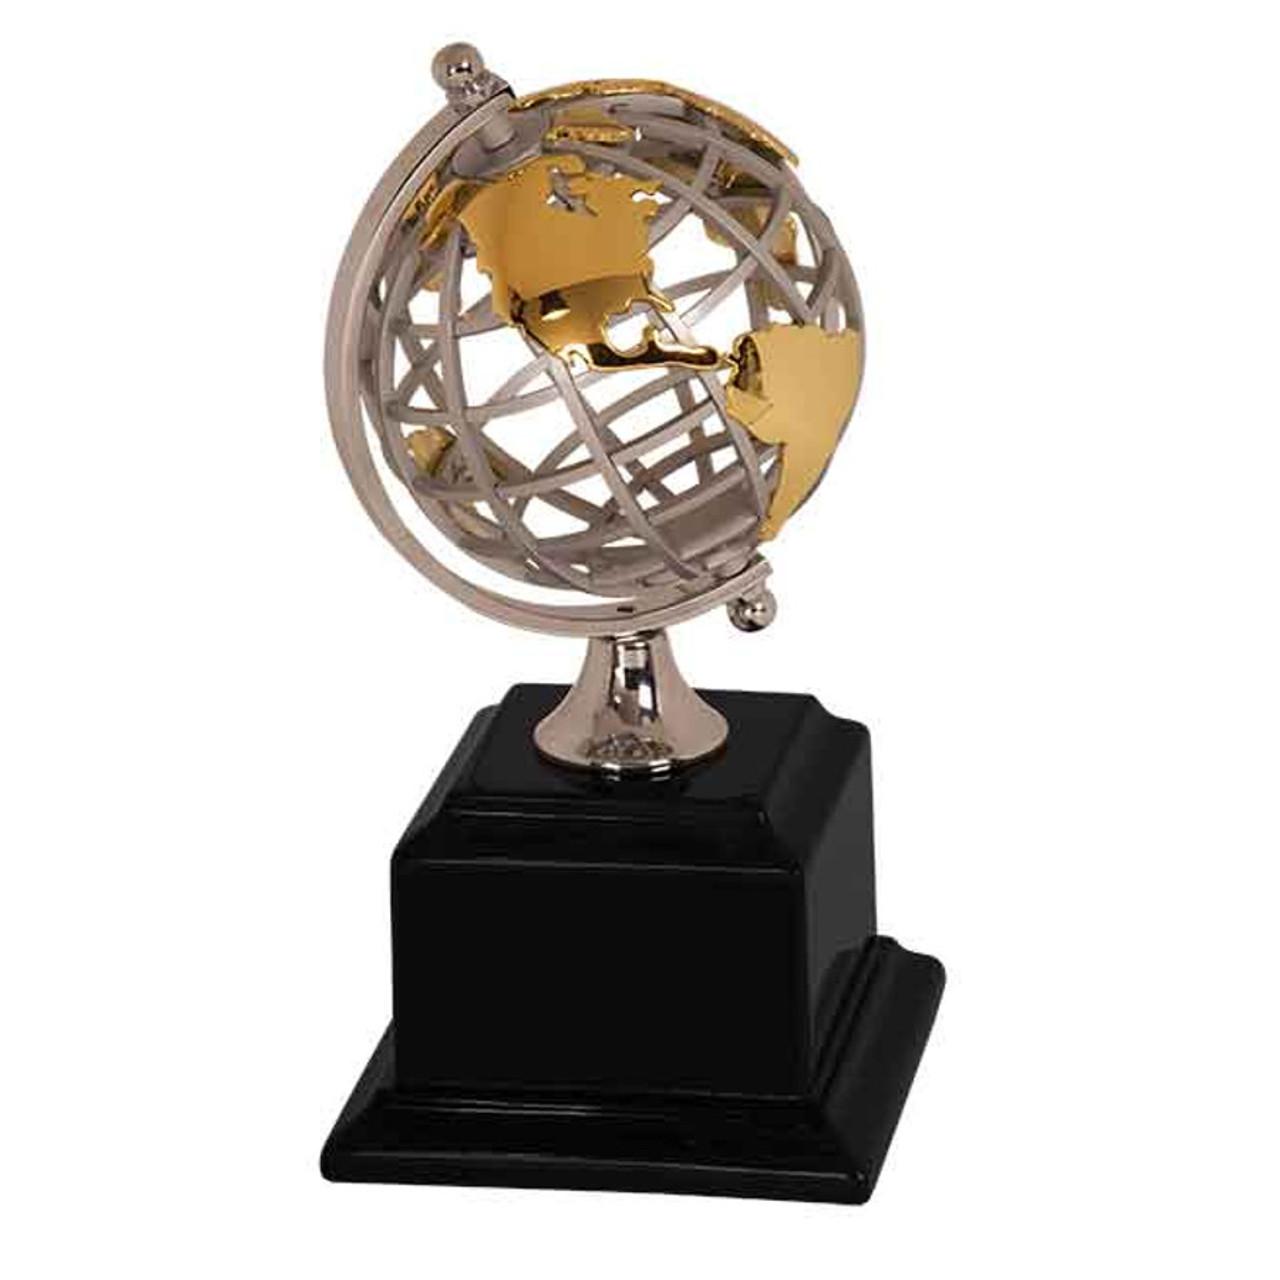 Gold/Silver Metal Globe on Base